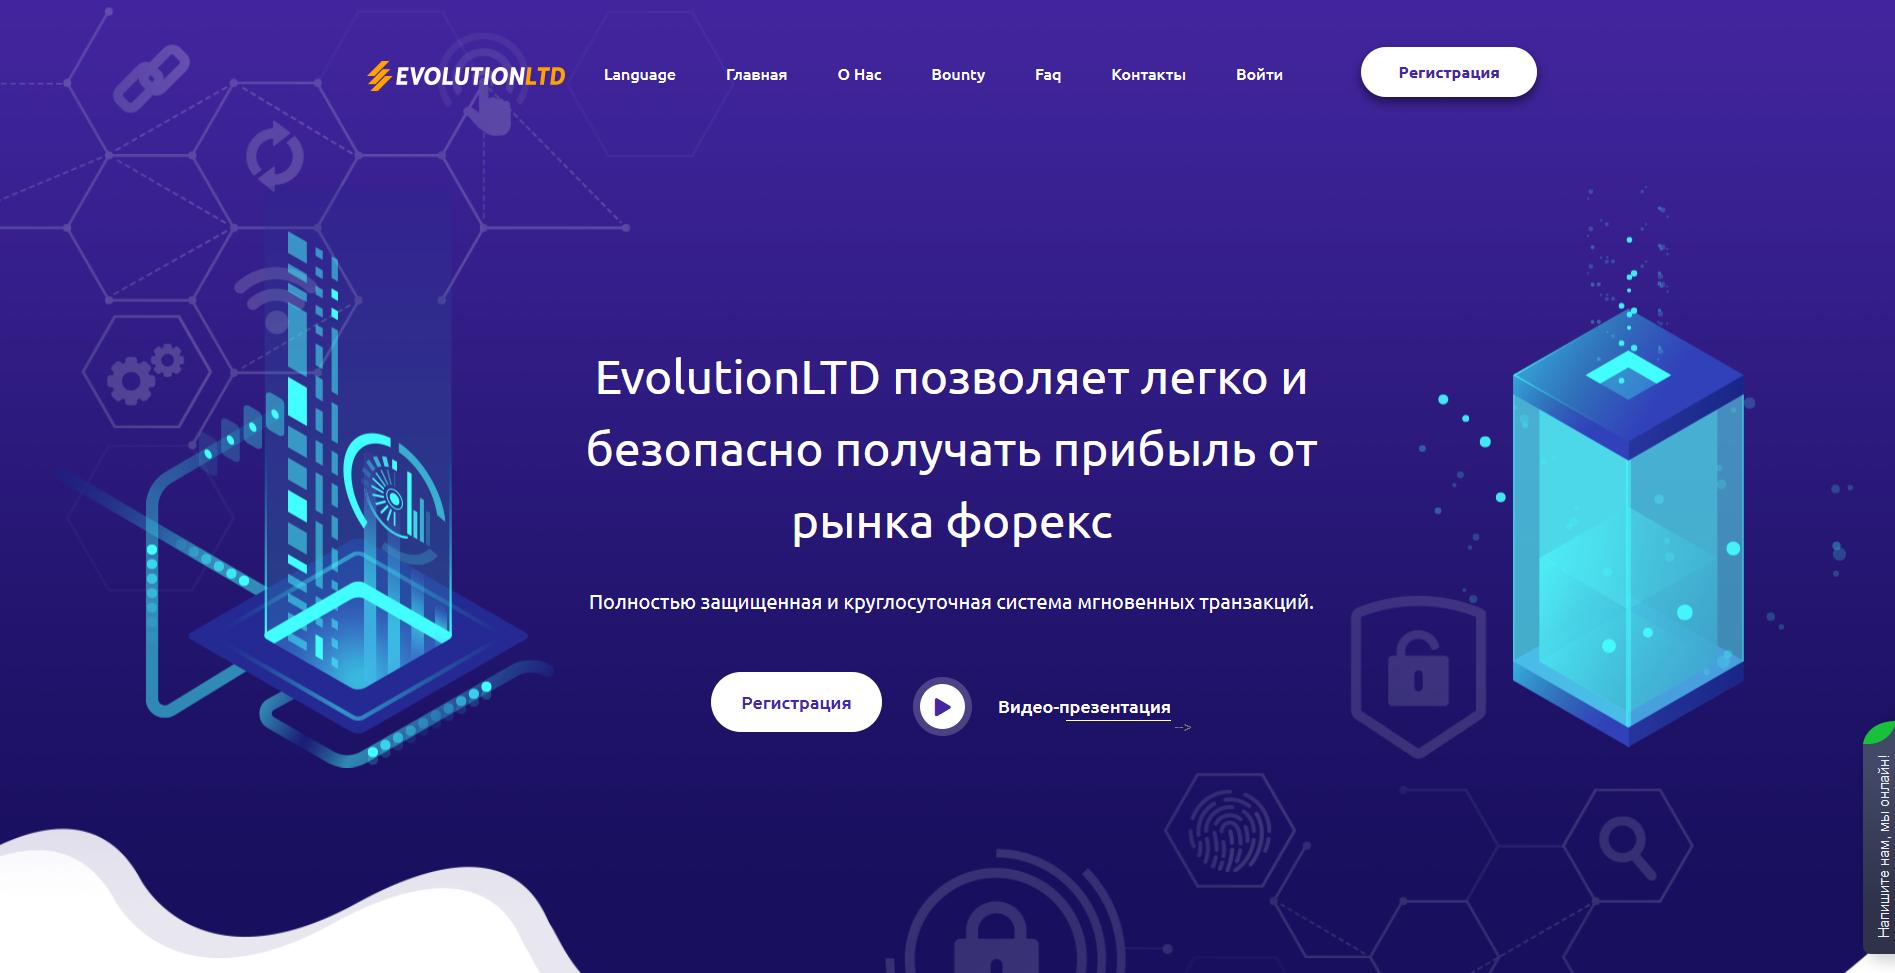 Evolutionltd - evolutionltd.cc